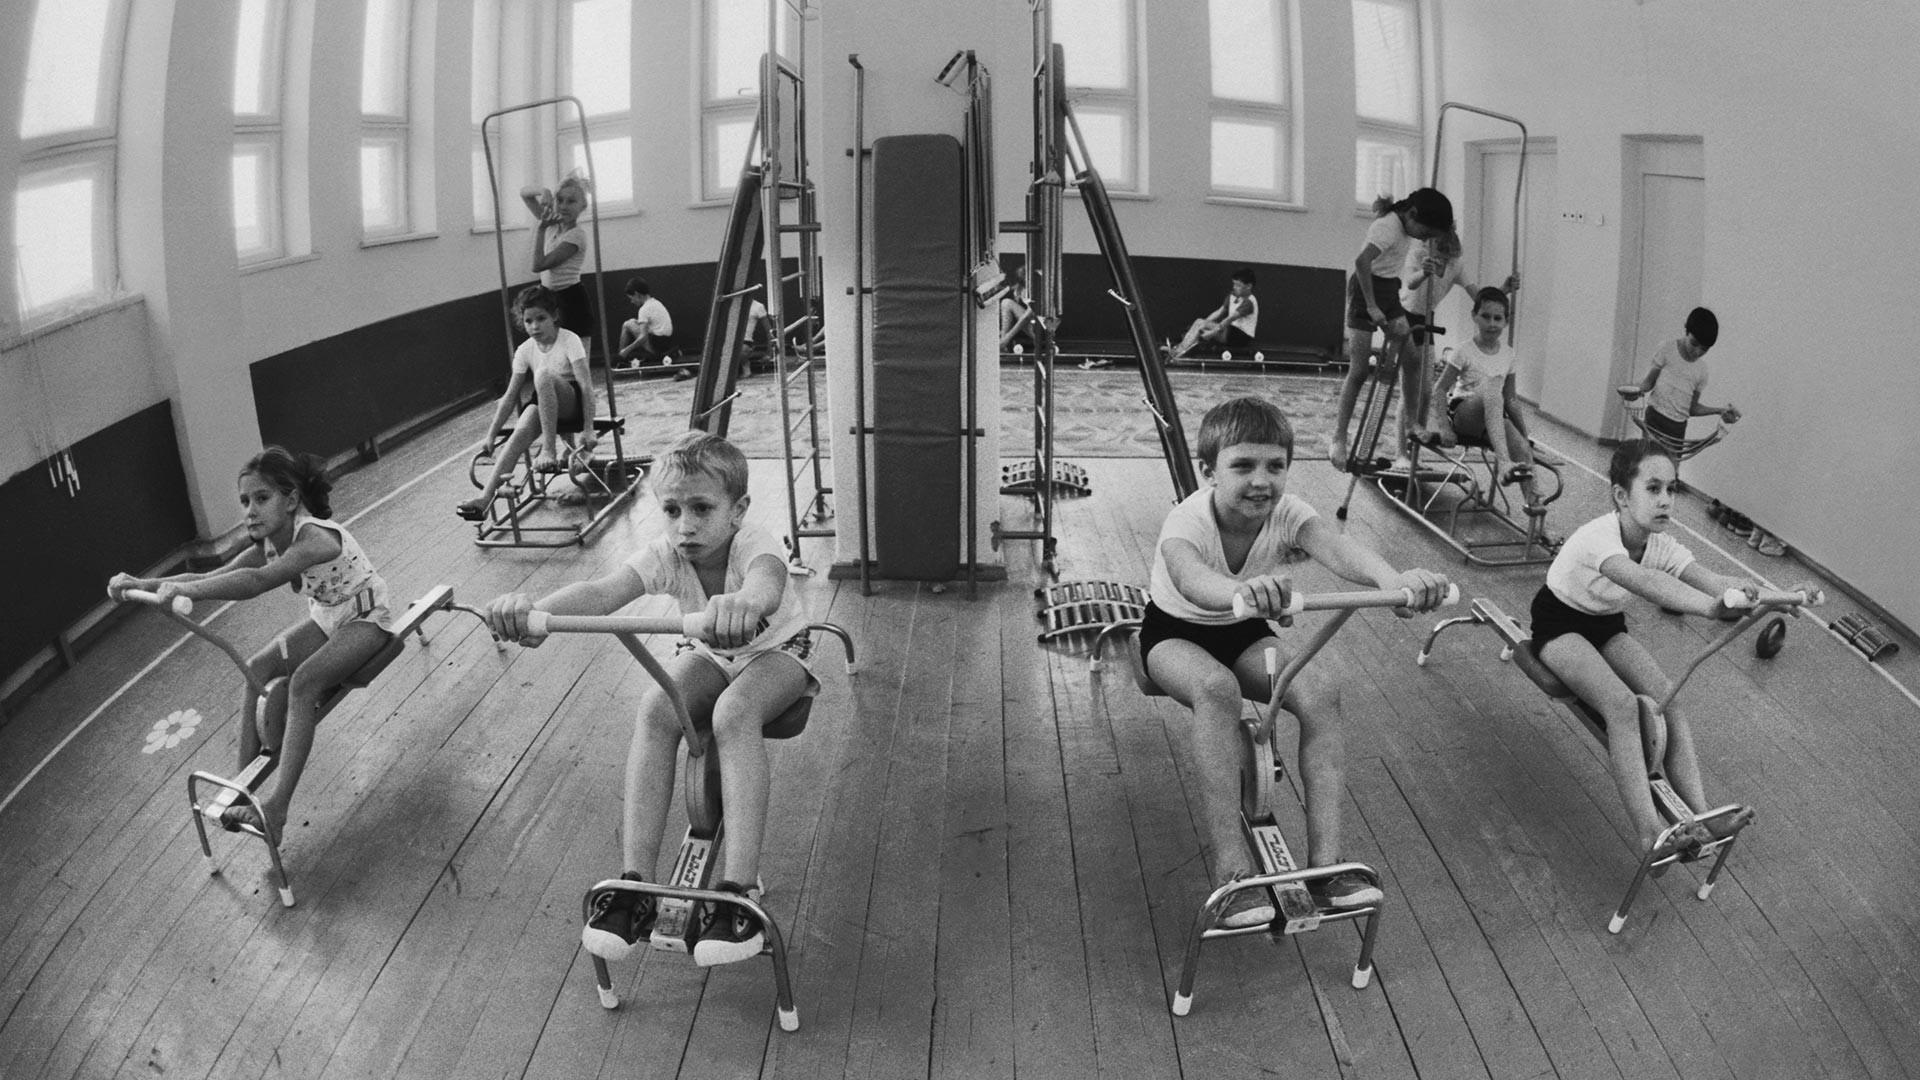 Soviet gym class